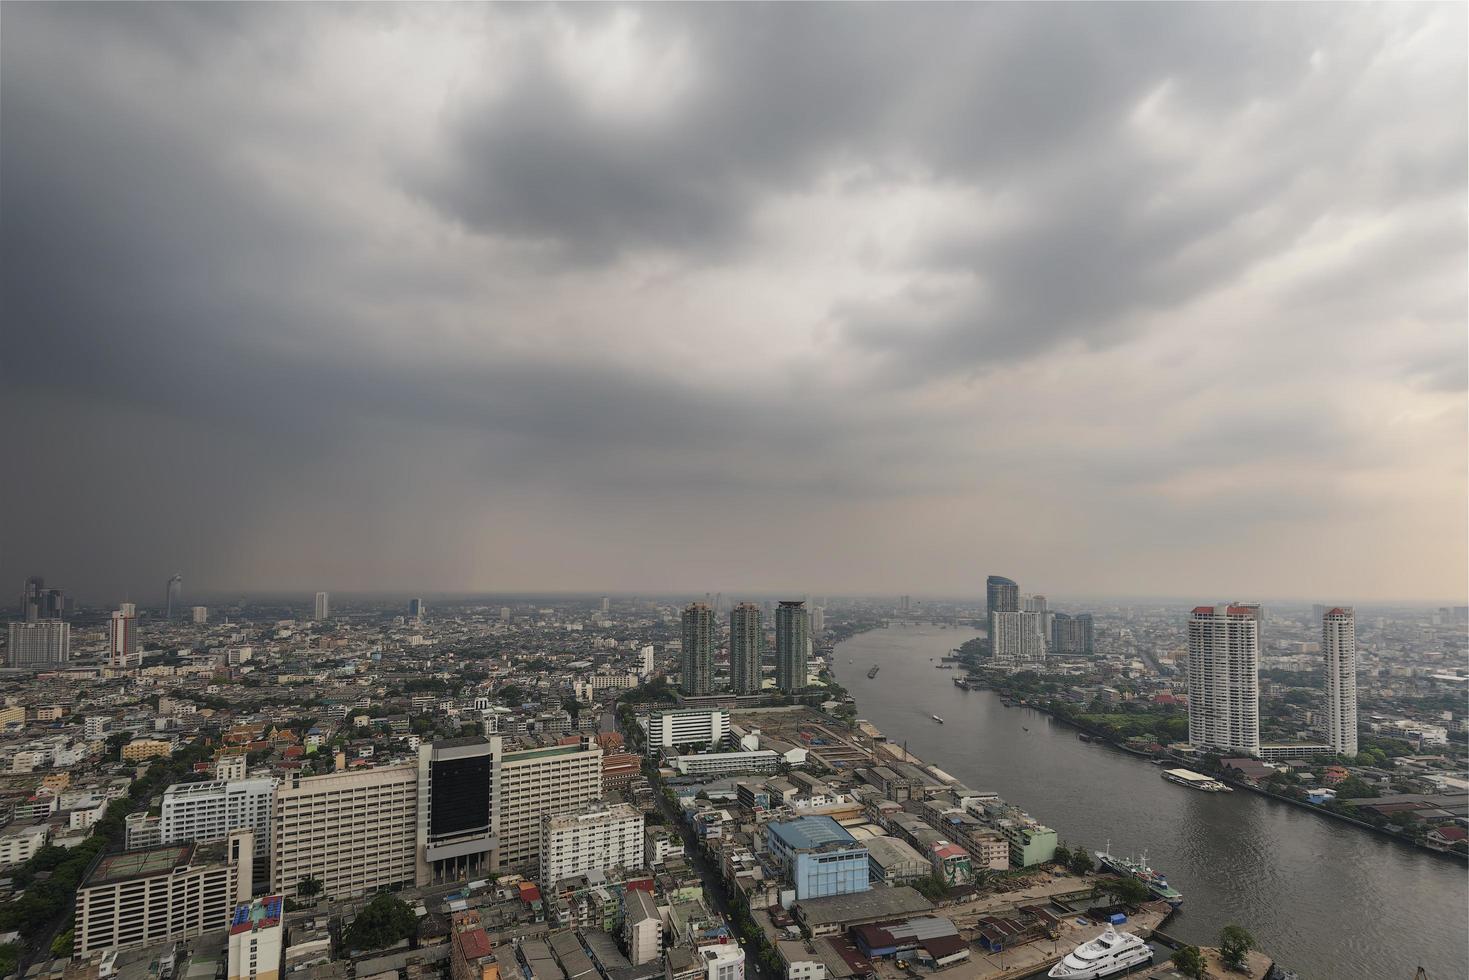 Bangkok city scape under cloudy skies photo